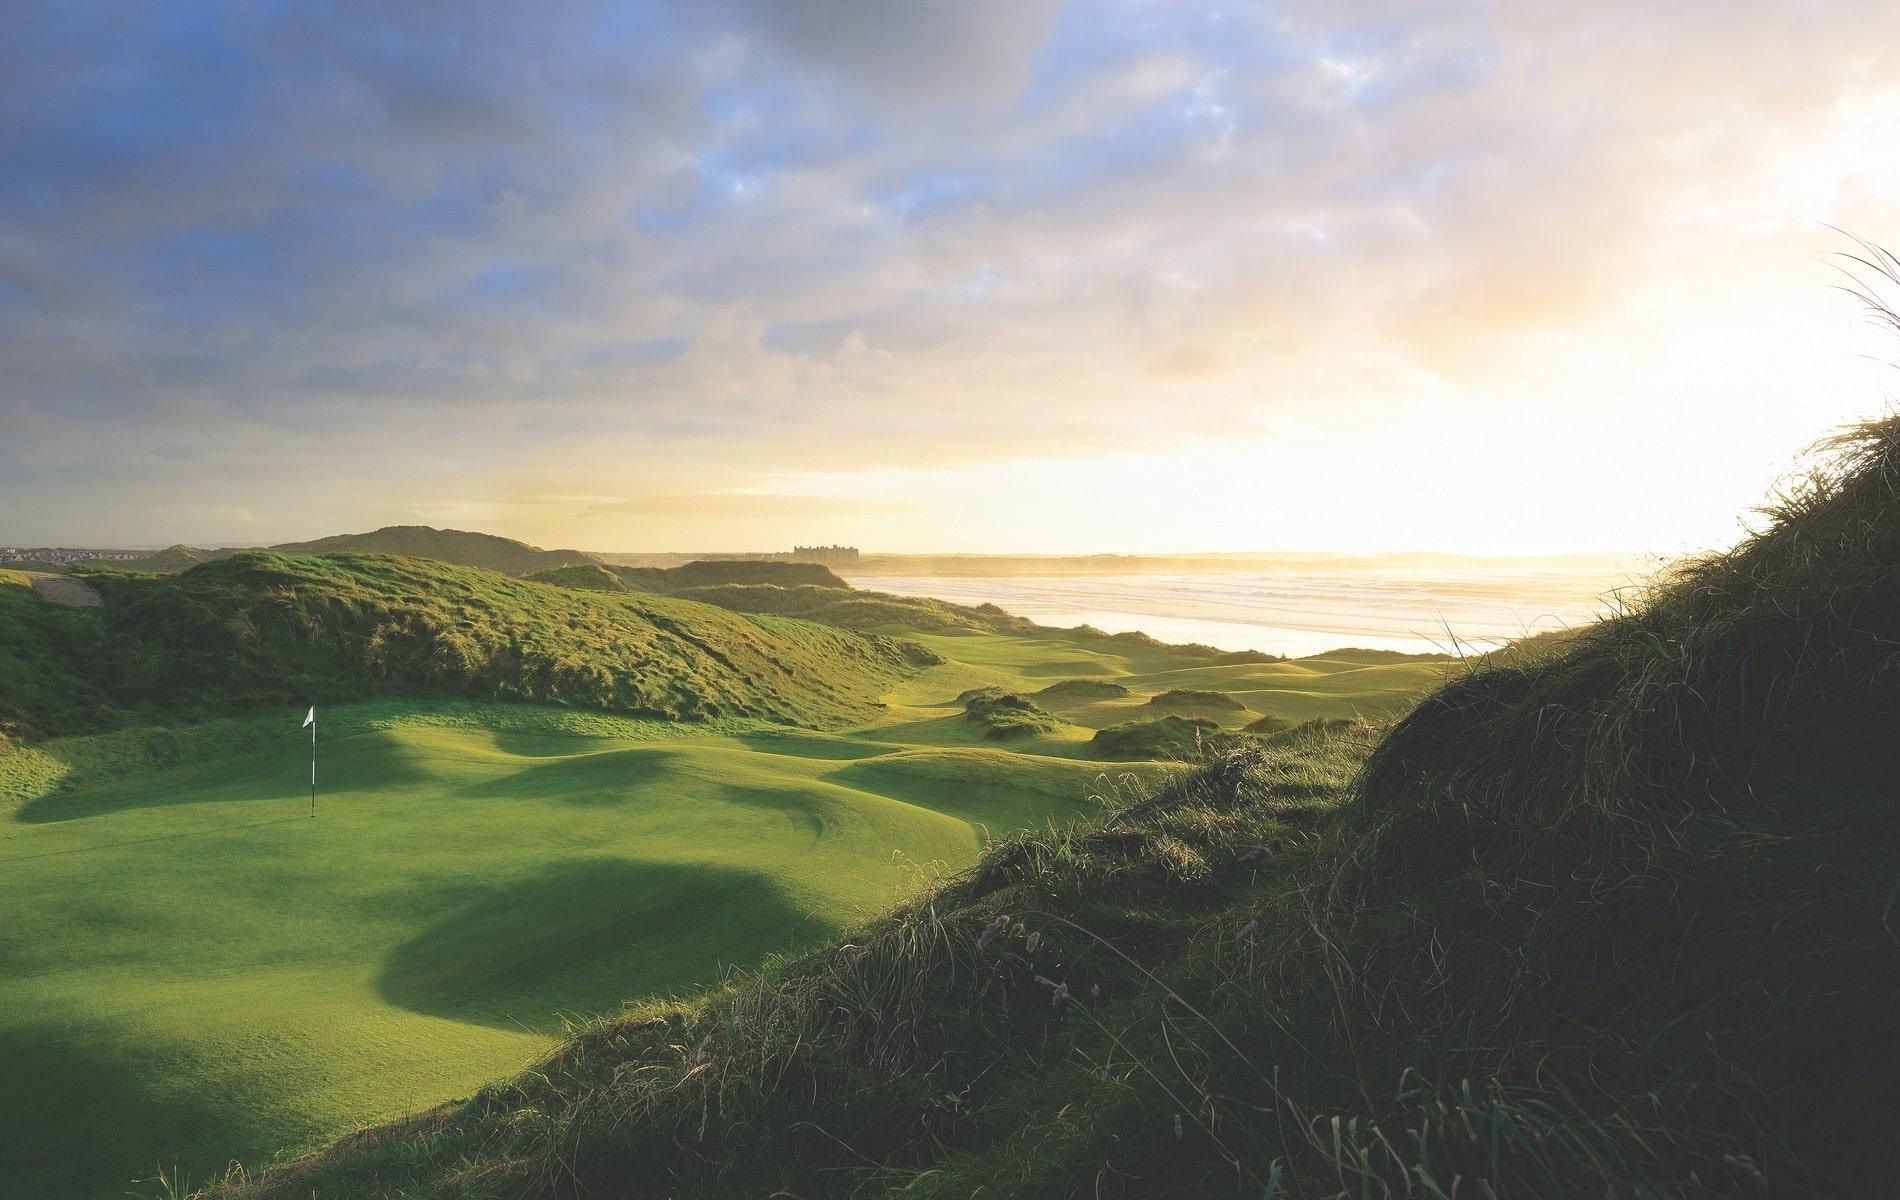 Trump International Golf Links, Ireland Golf, Golfscape